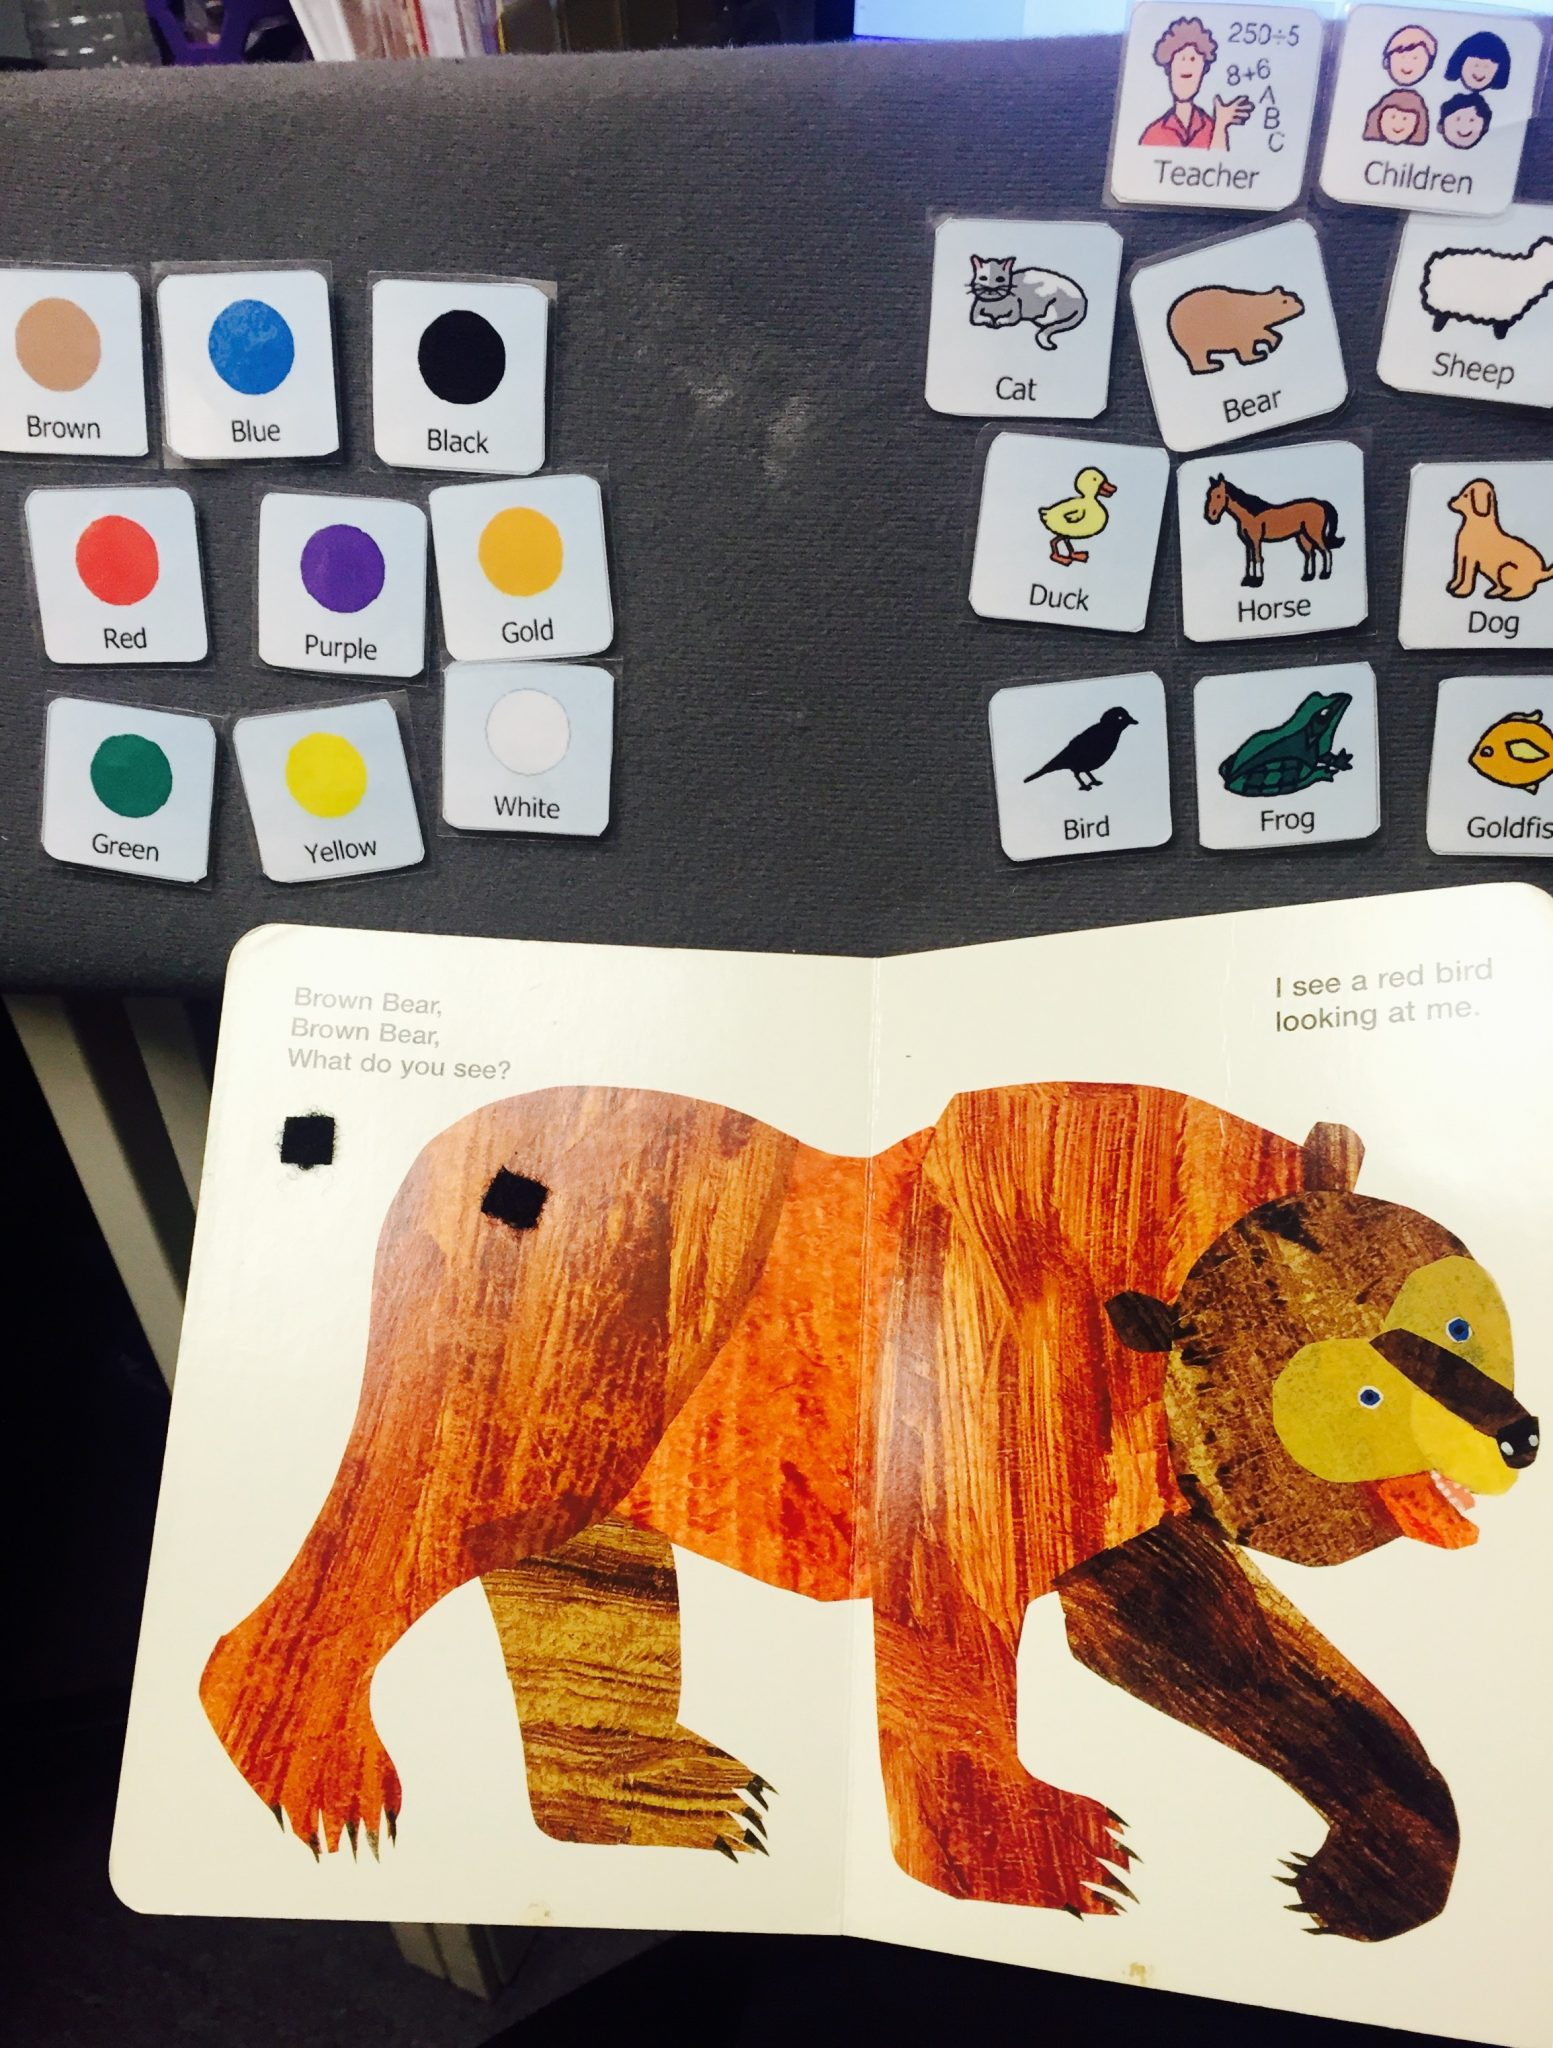 Adapting A Book For Language Development